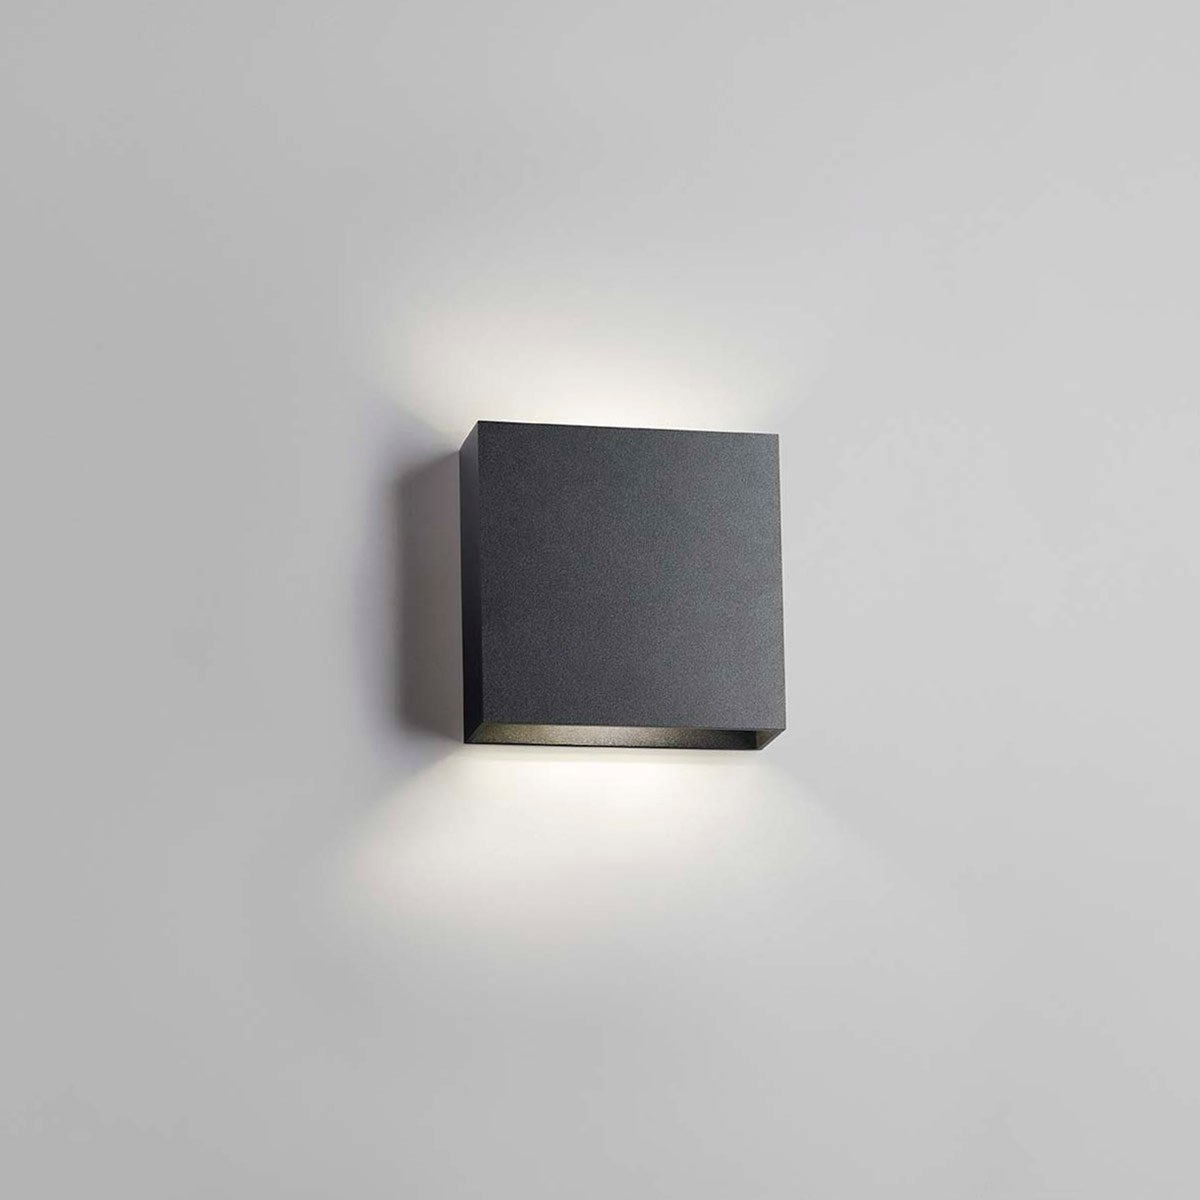 Compact vegglampe fra Light-Point